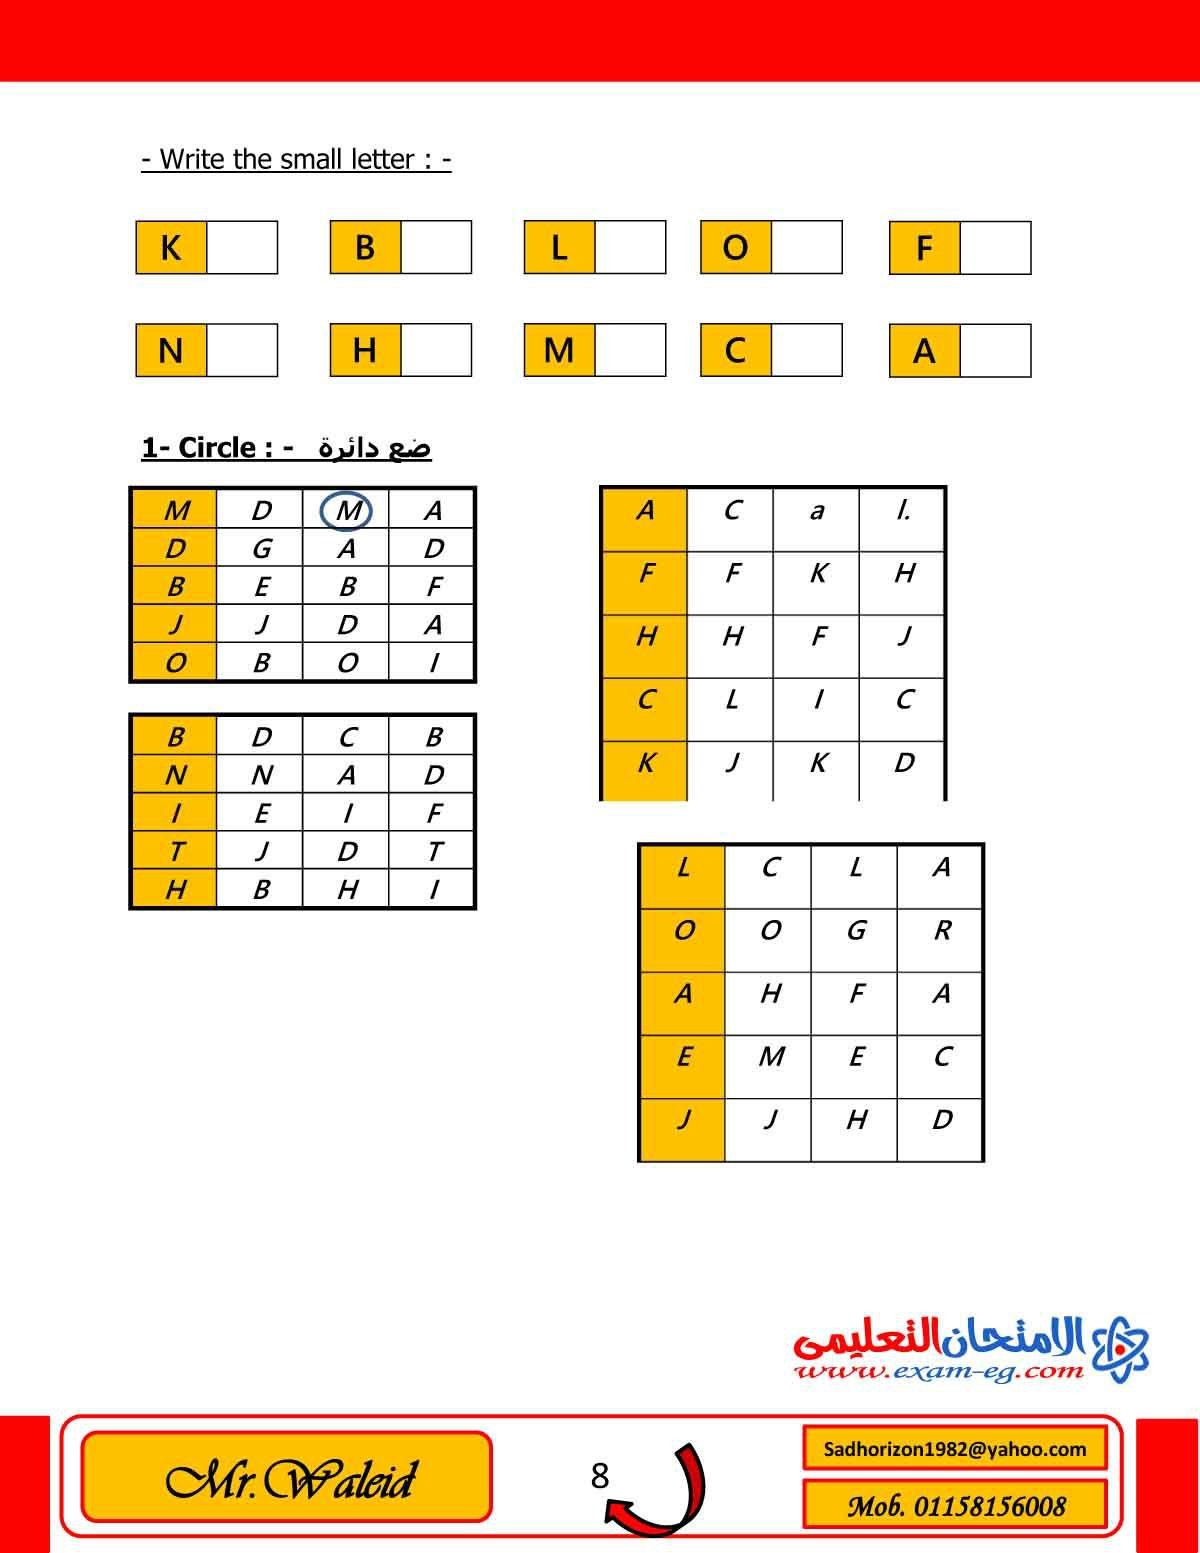 exam-eg.com_1449405243398.jpg